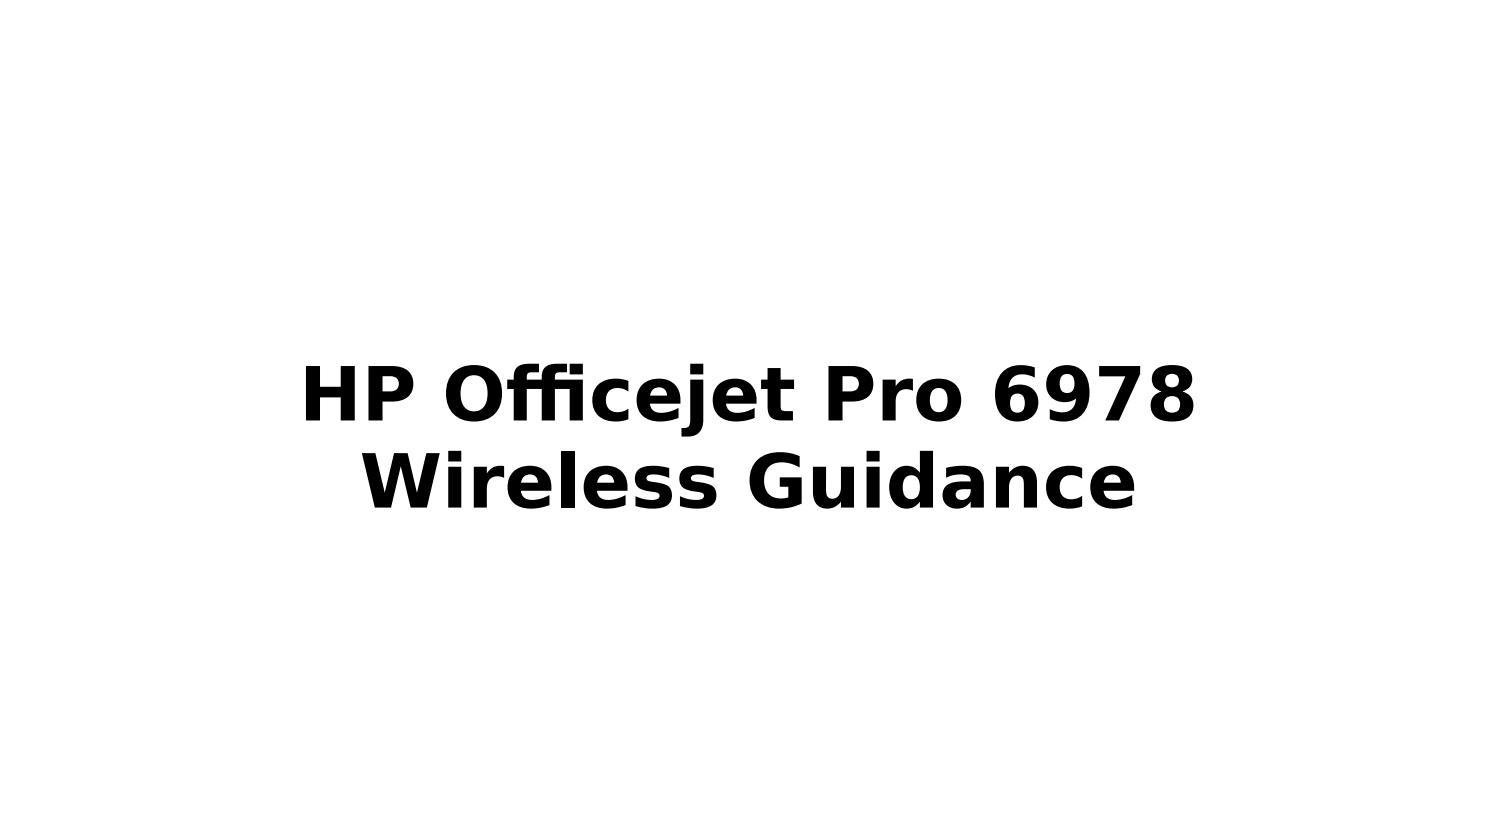 123 HP Officejet Pro 6978 Setup Wireless Guidance by printer